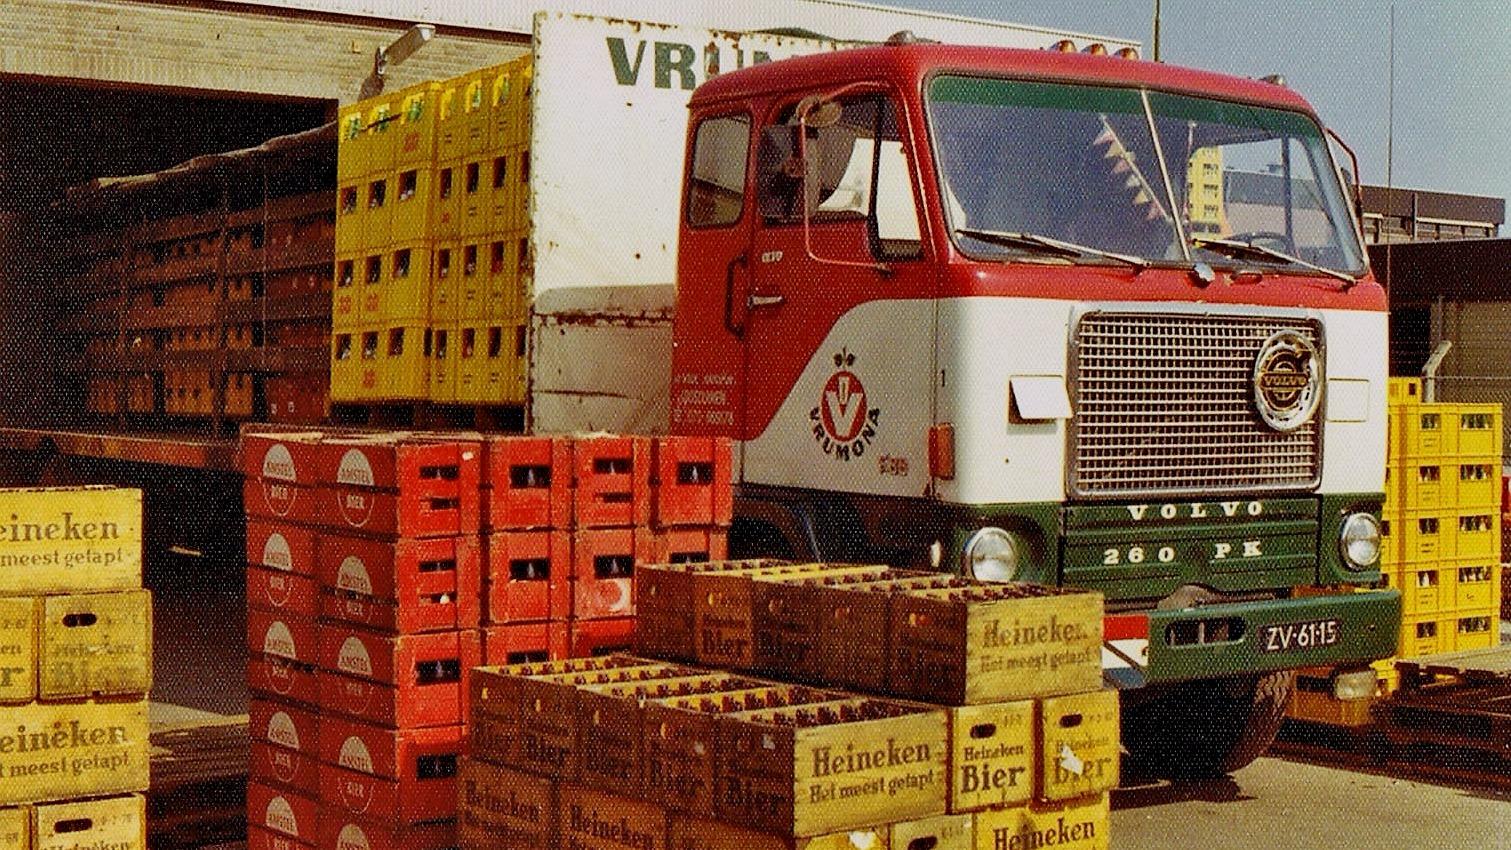 Volvo--van-Frumona-Peter-Lock-foto